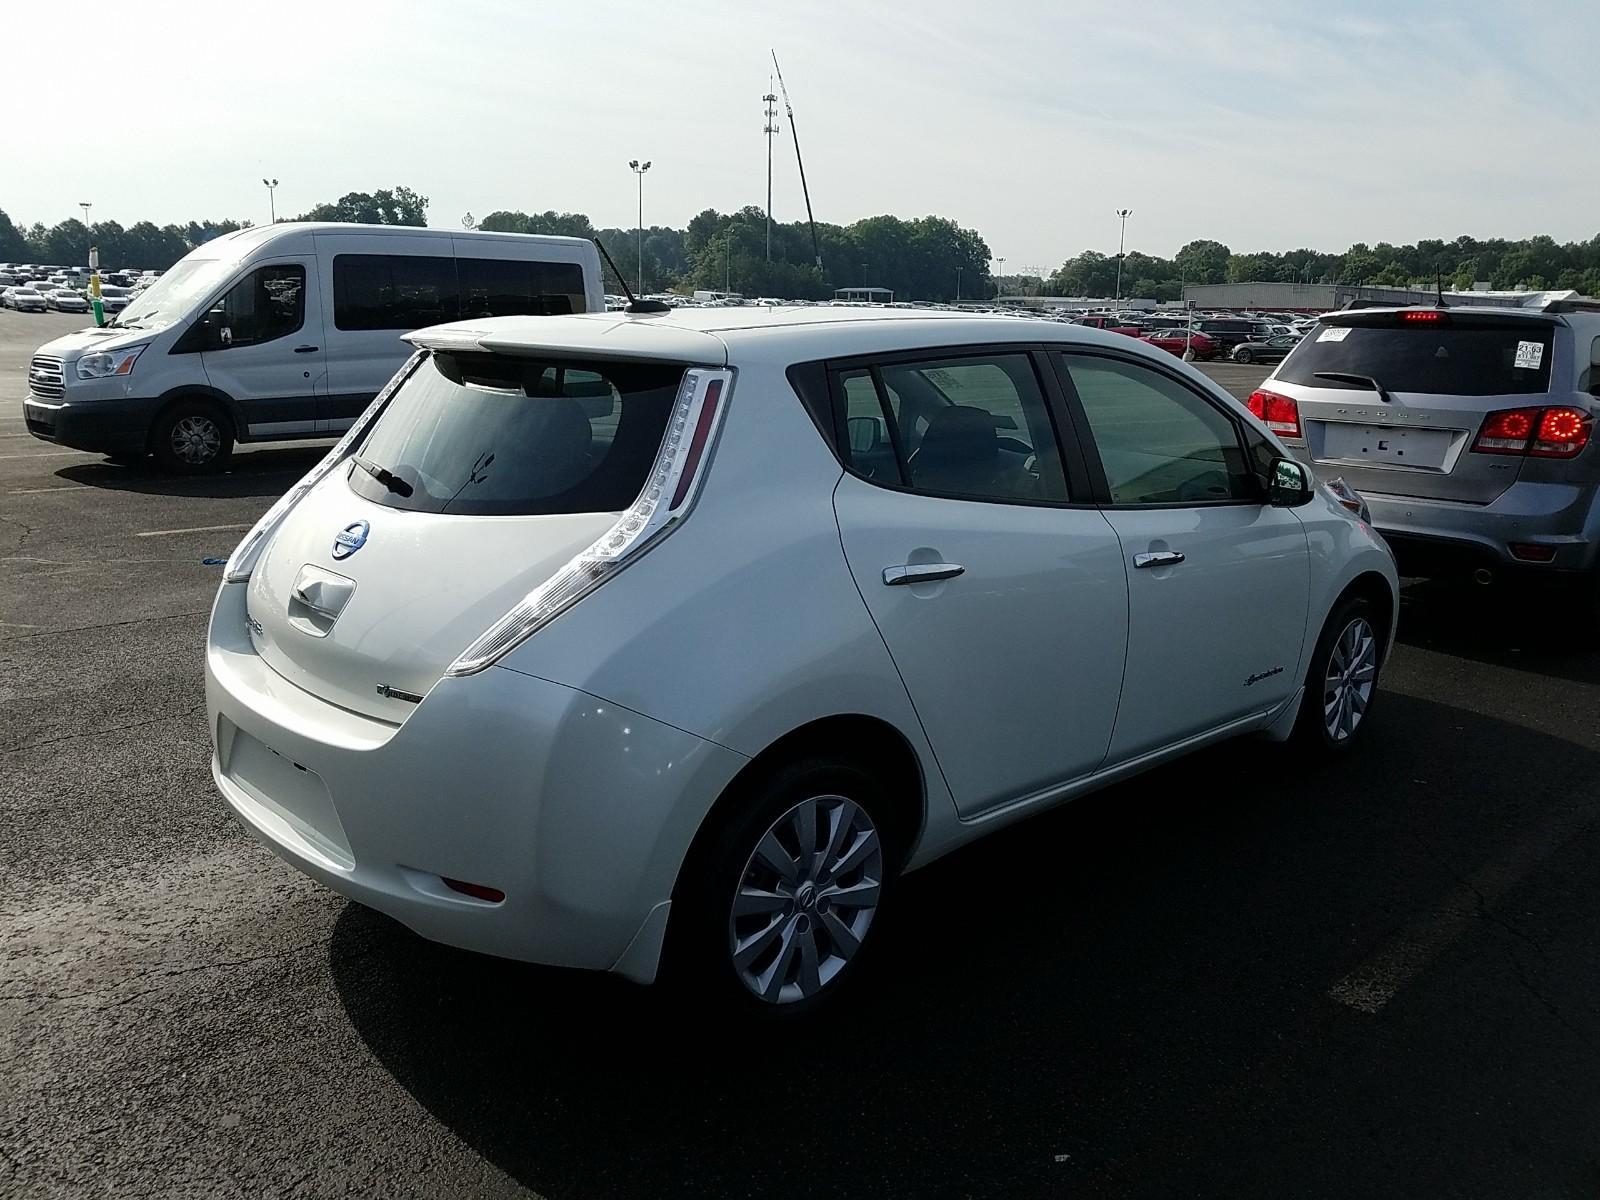 Nissan LEAF S ELECTRIC S 2016 USA Americanavto